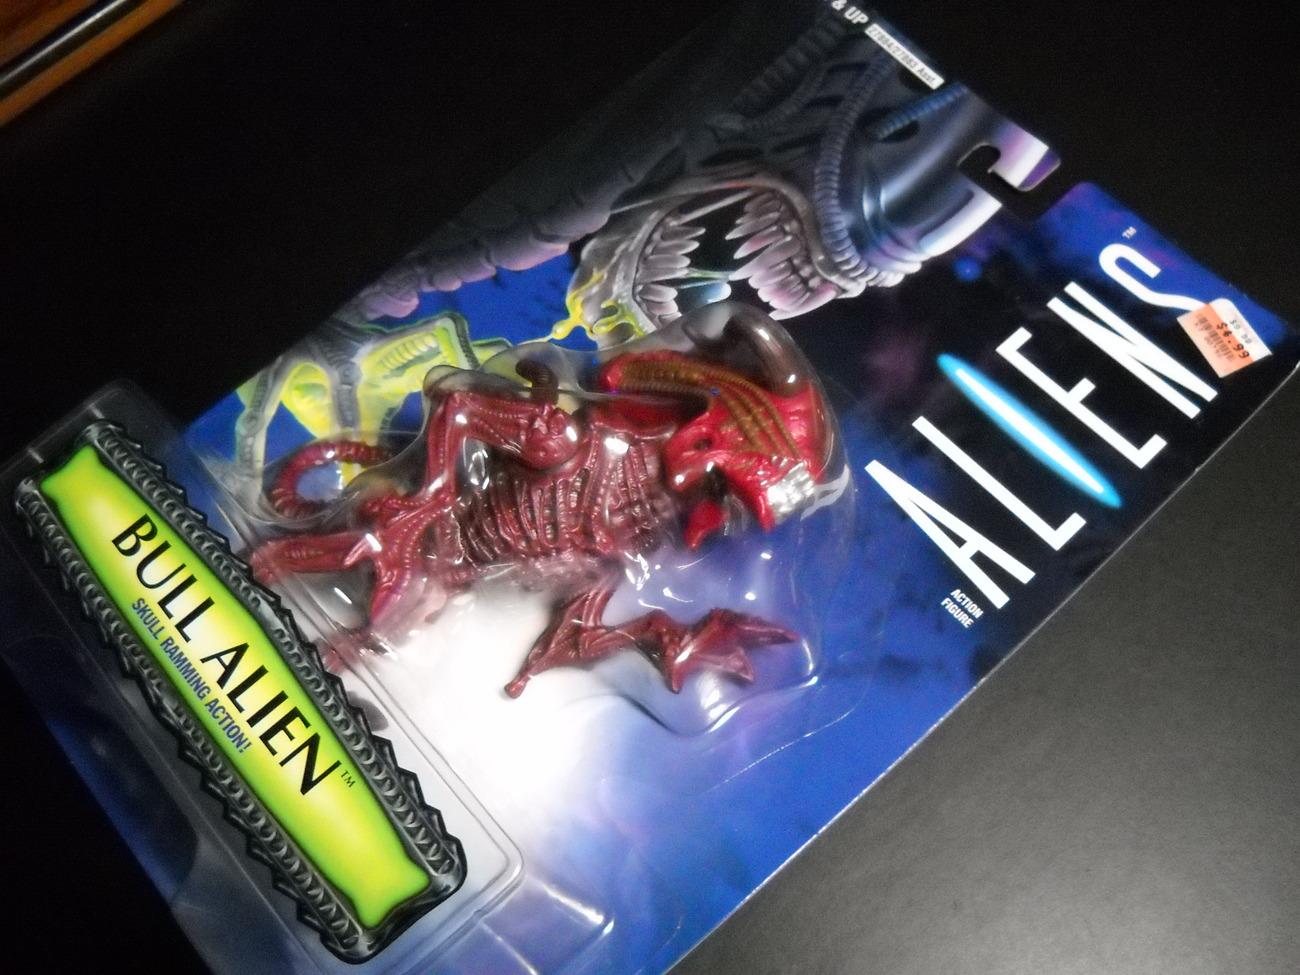 Kenner Hasbro Aliens 1996 Bull Alien Ramming Action Factory Sealed Blister Card